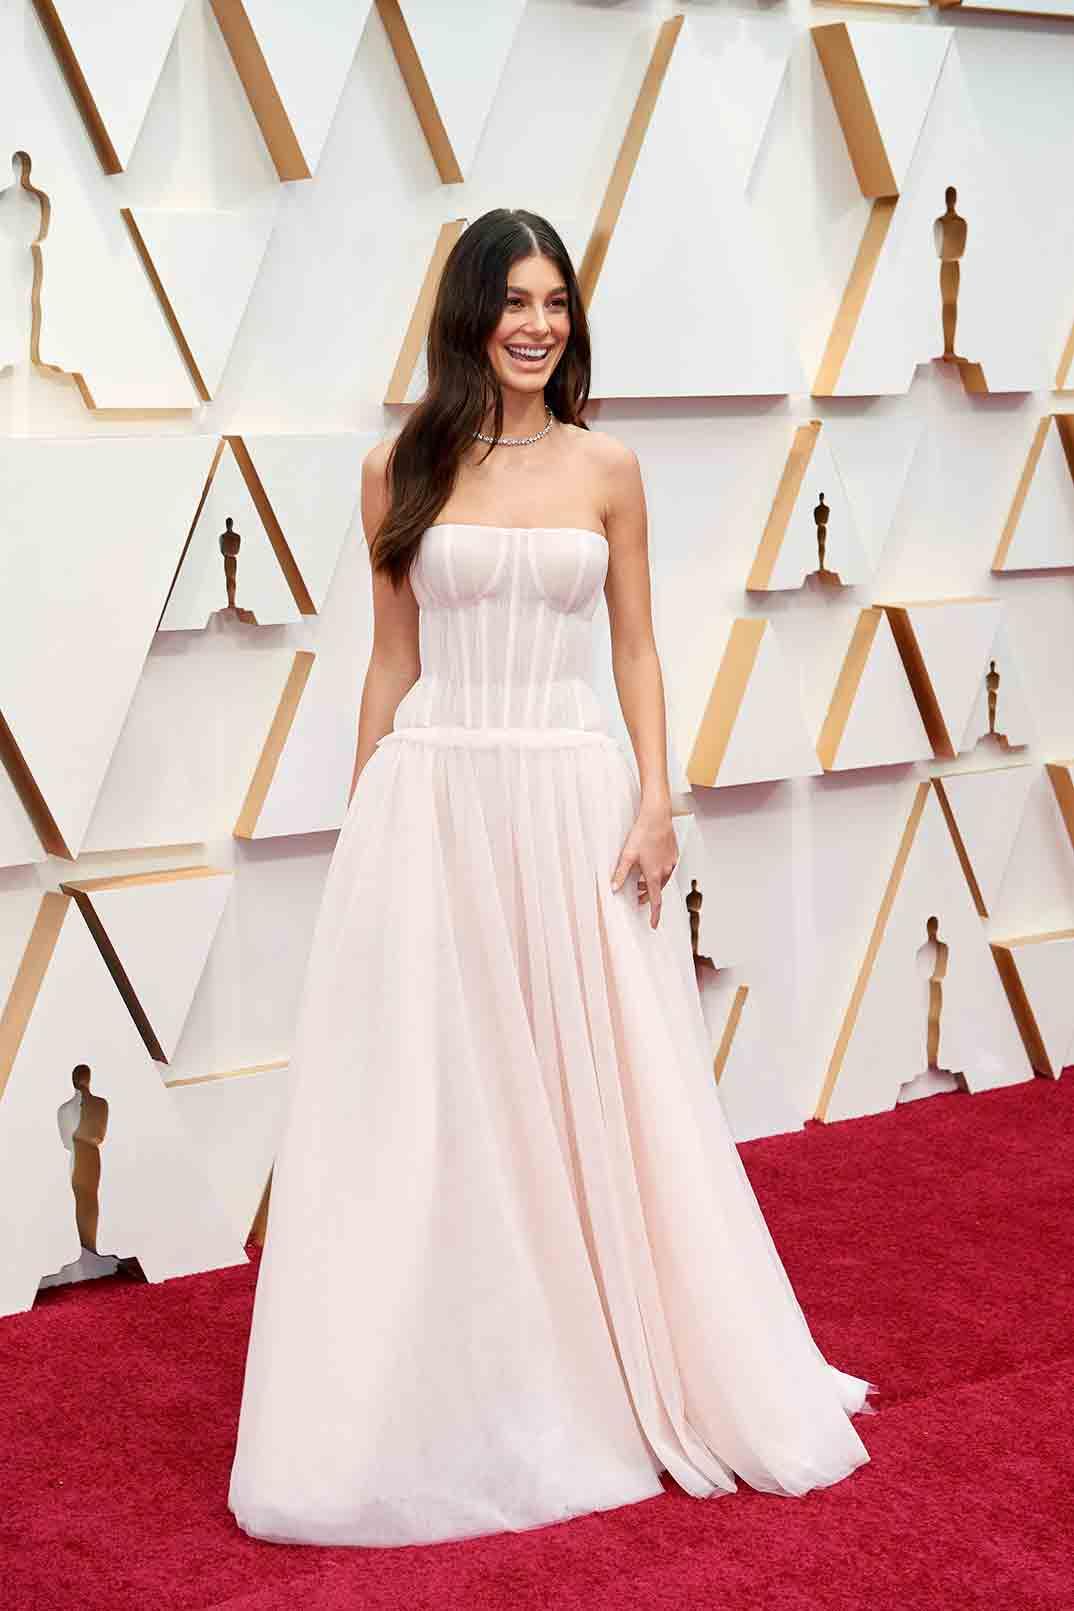 Camila Morrone - Oscars 2020 © A.M.P.A.S.